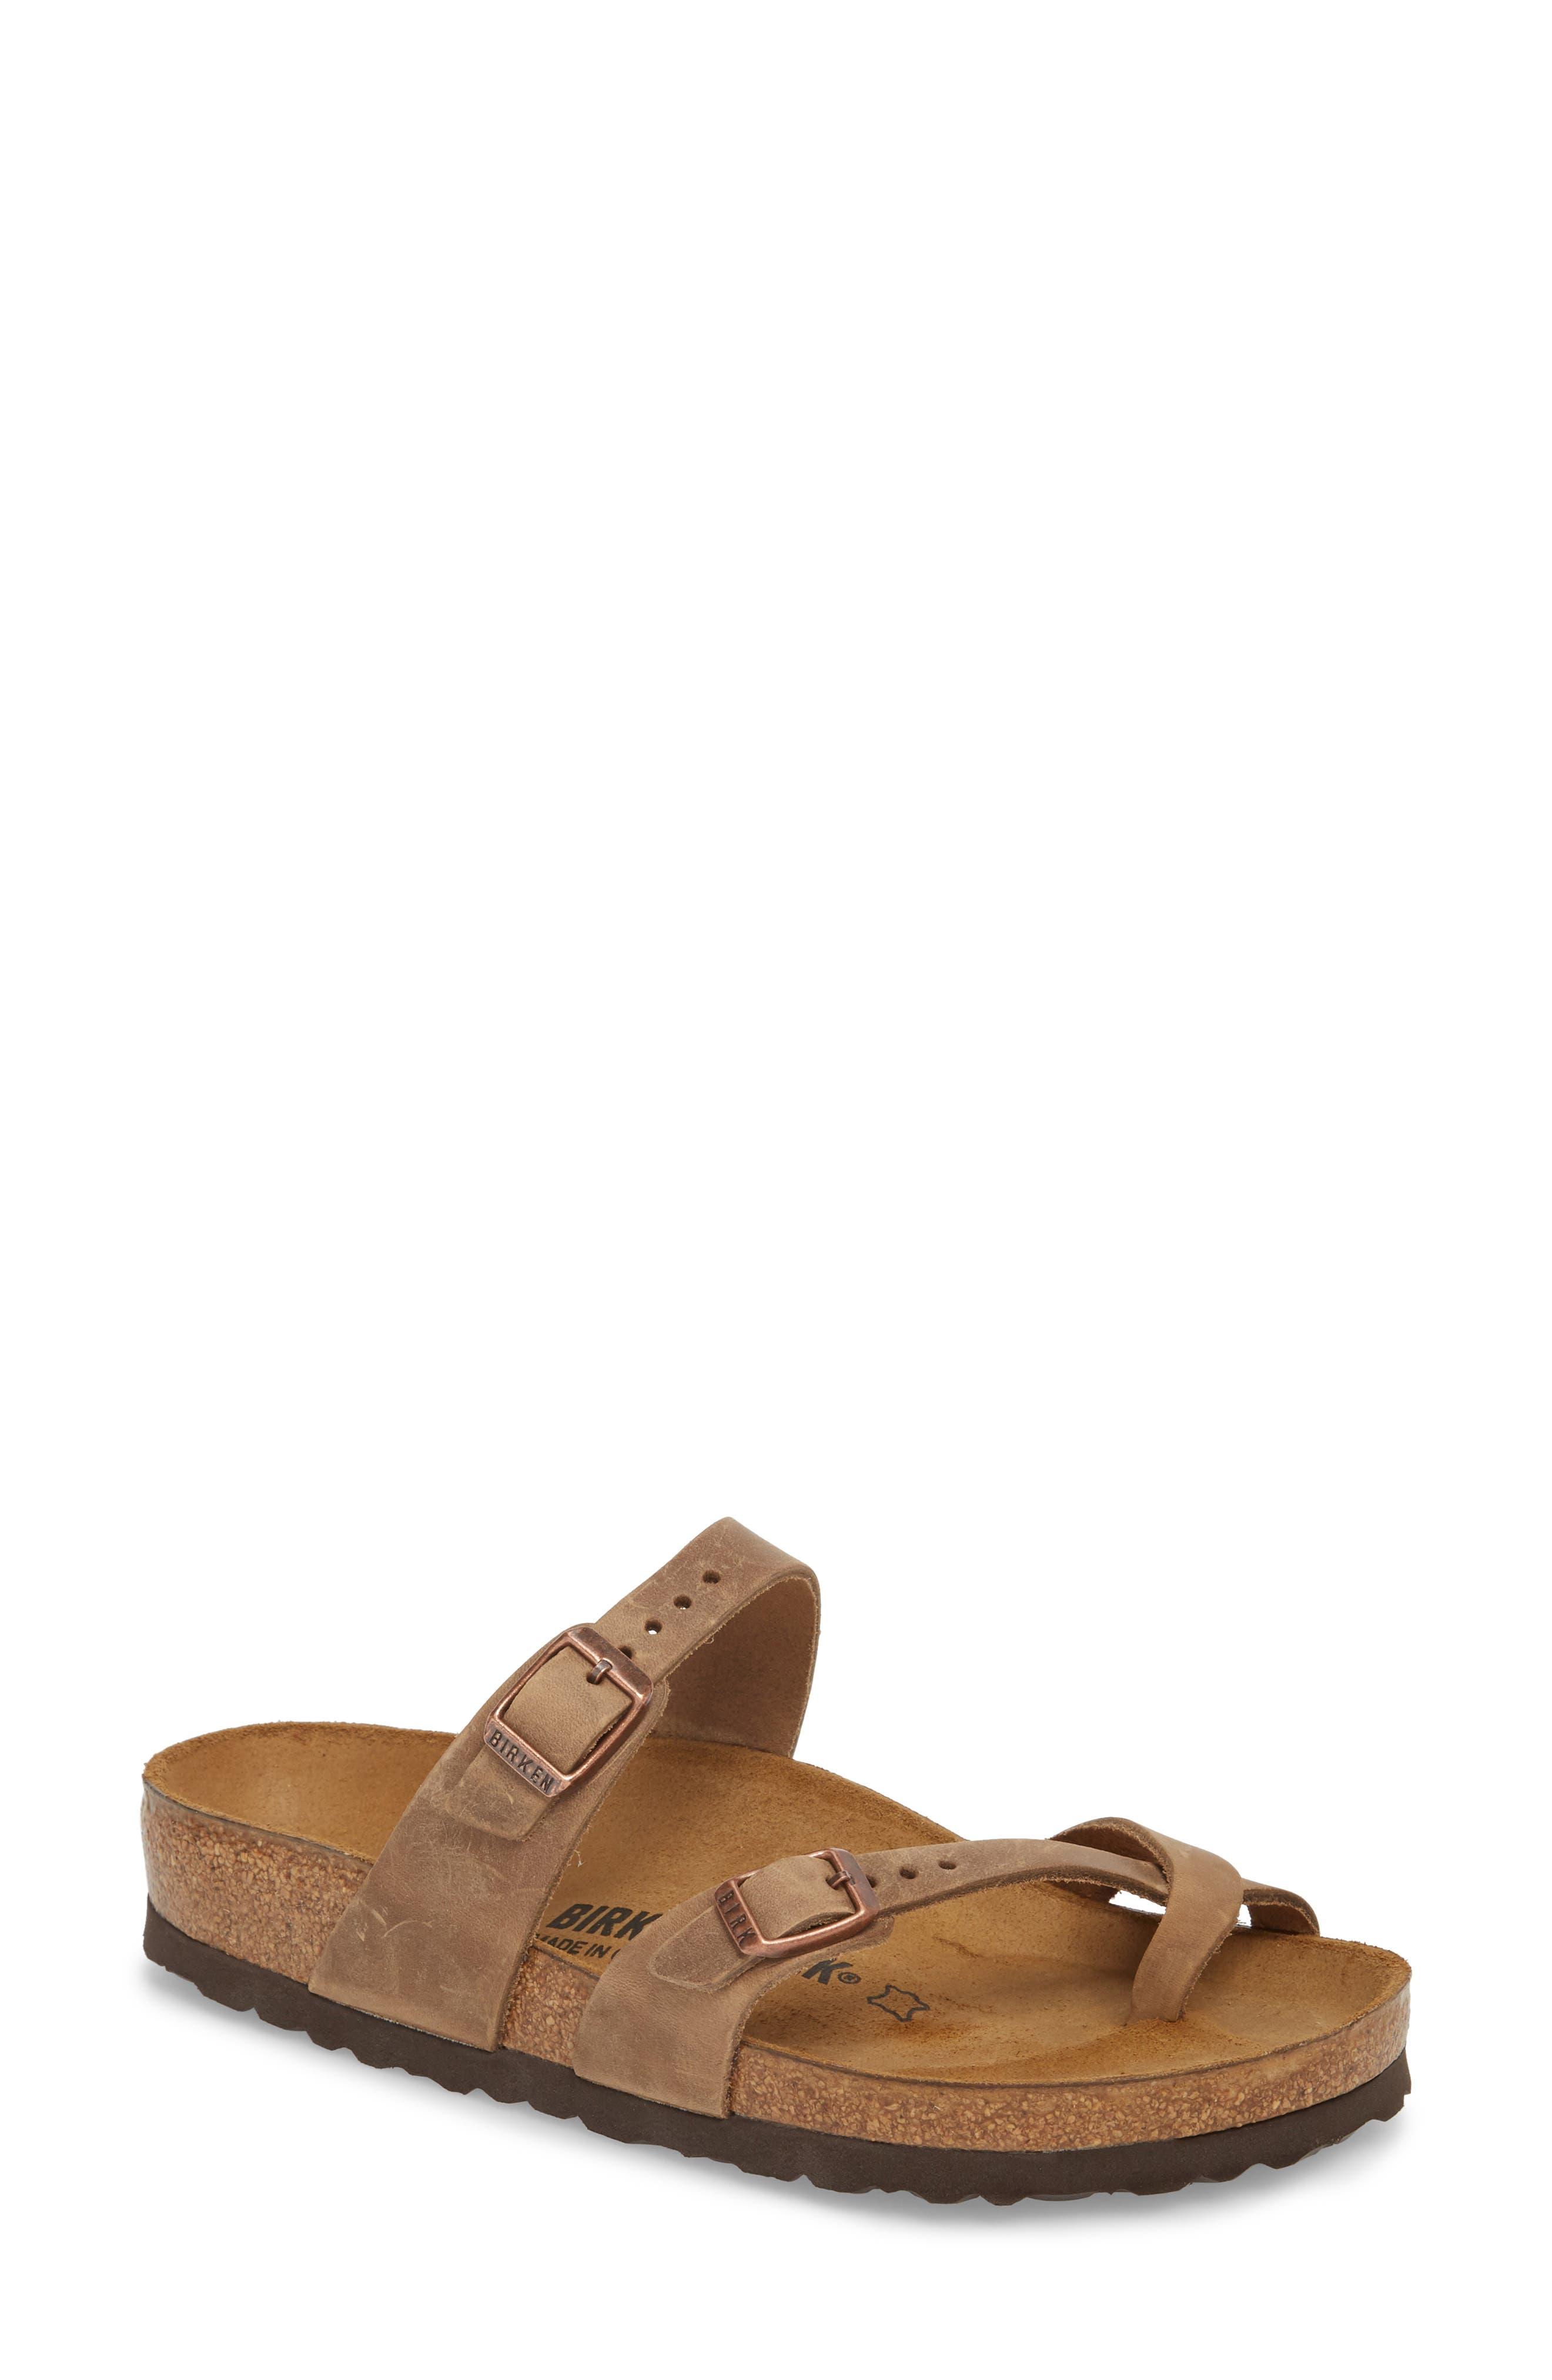 Mayari Slide Sandal,                         Main,                         color, Tobacco Oiled Leather